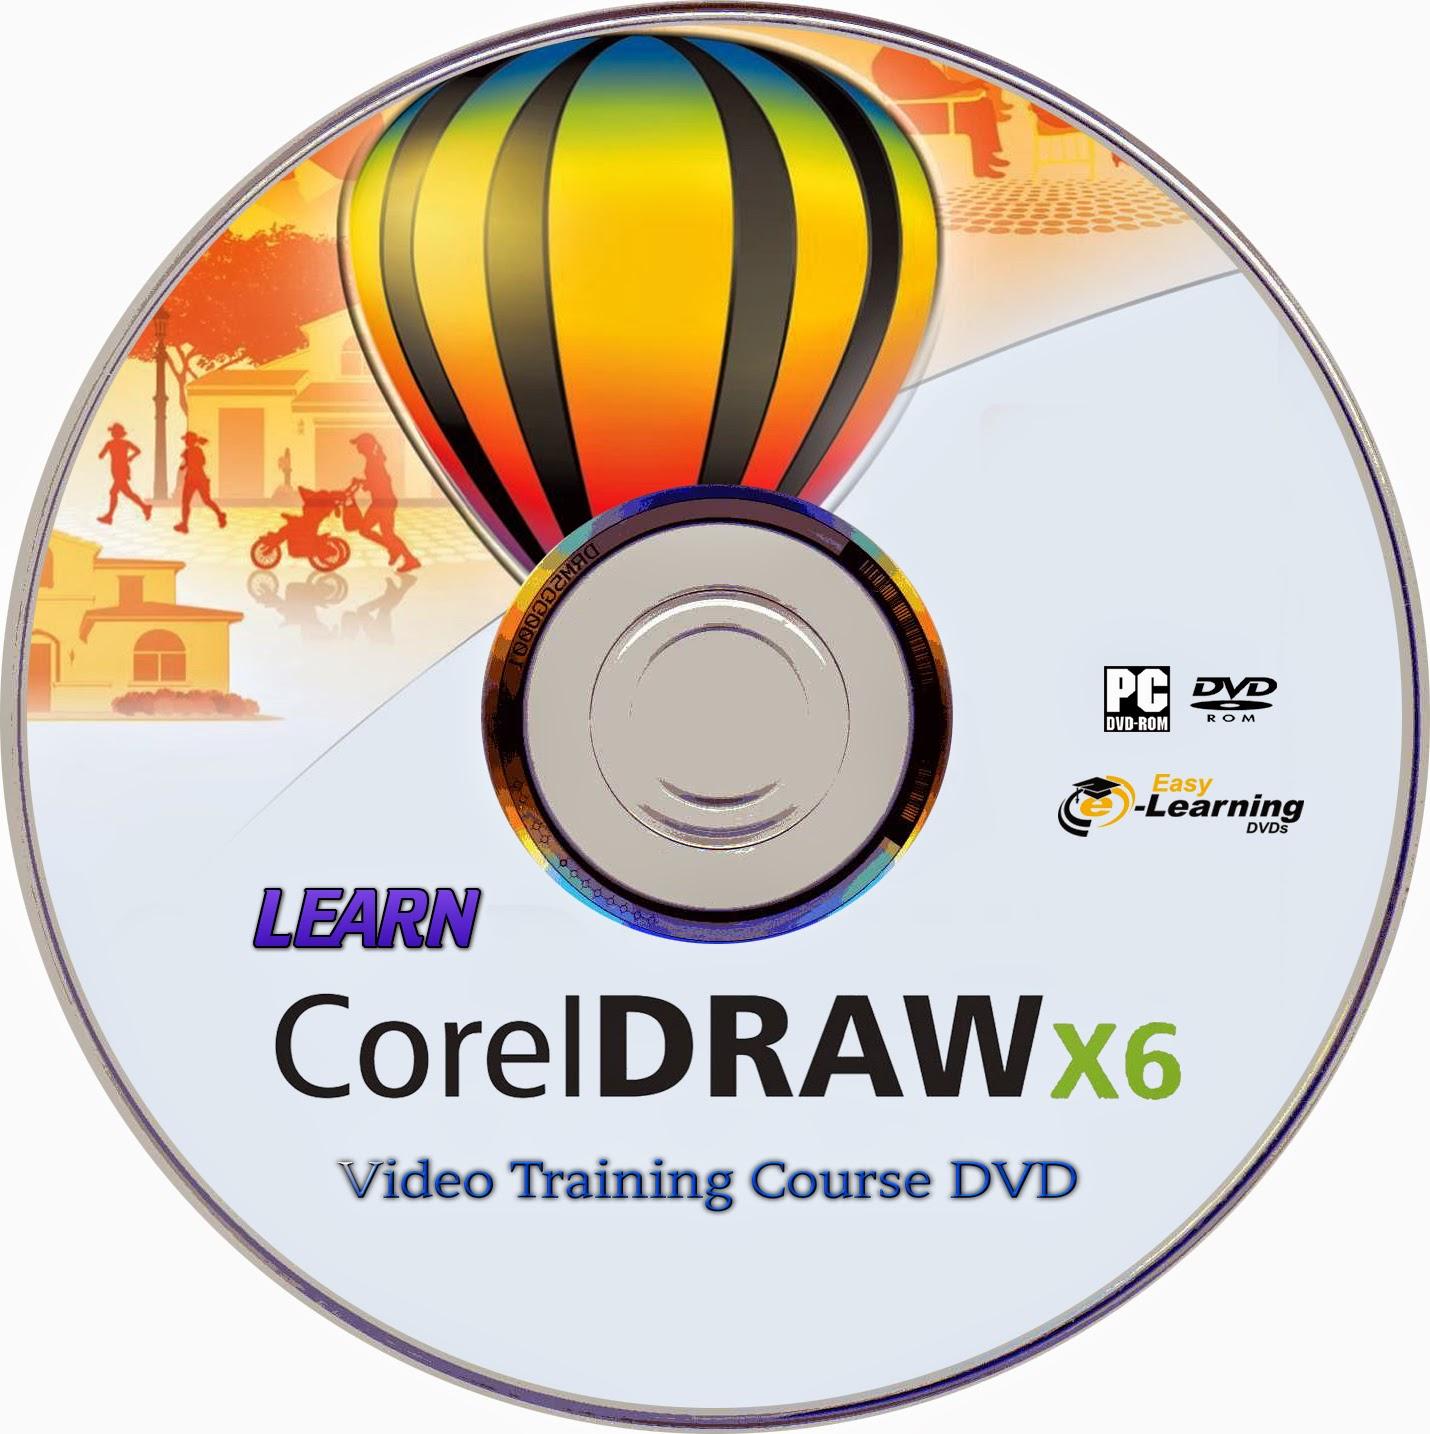 Tutorials DVD world: CorelDRAW X6 Video Training Tutorial DVD Rs 299/-